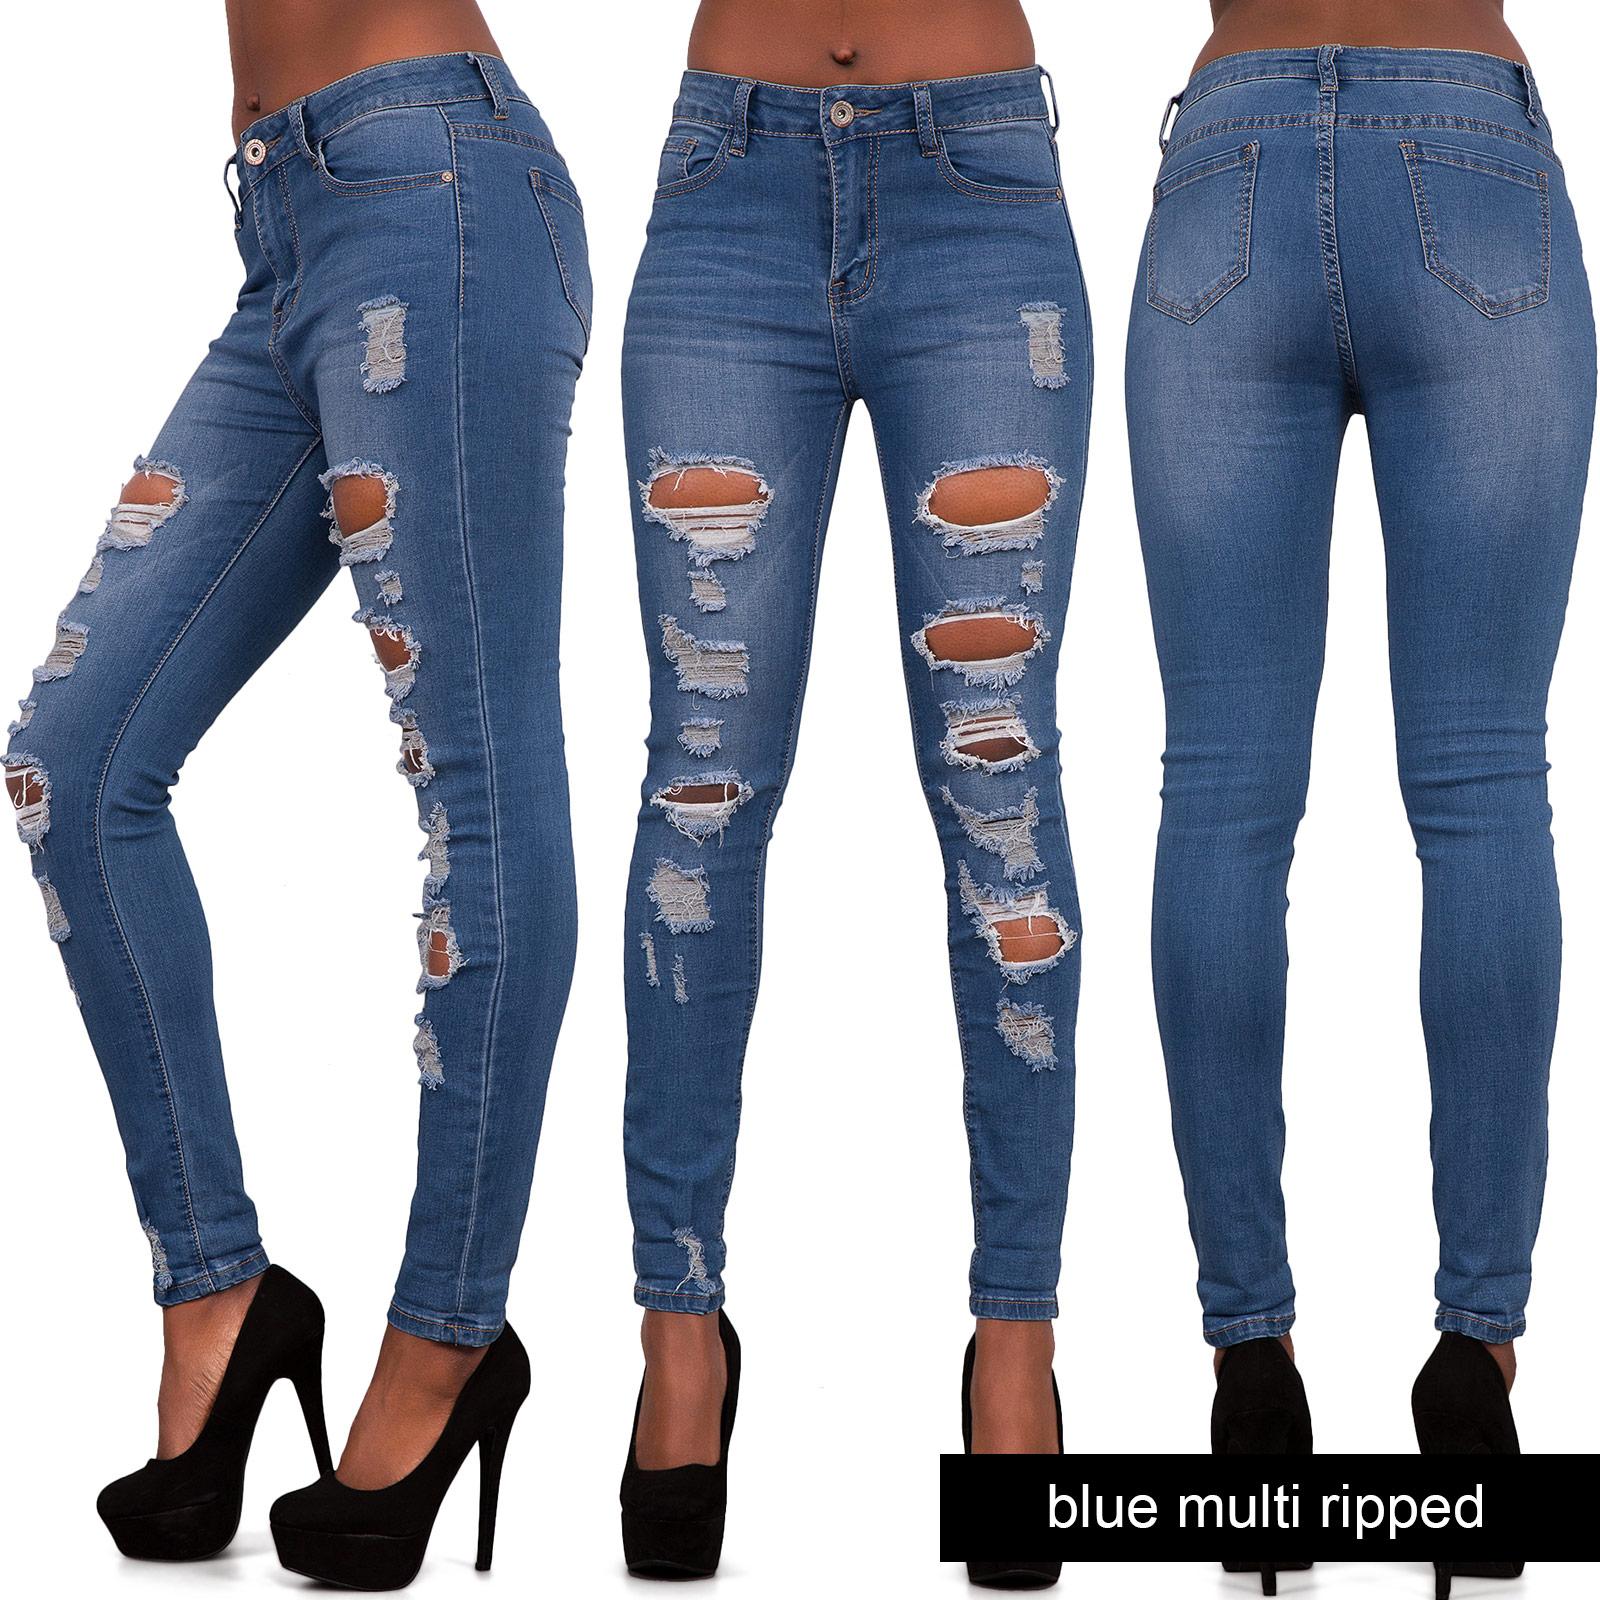 Womens Blue Ripped Skinny Jeans Ladies Jeggings Slim Fit Denim Size 6 8 10 12 14   eBay